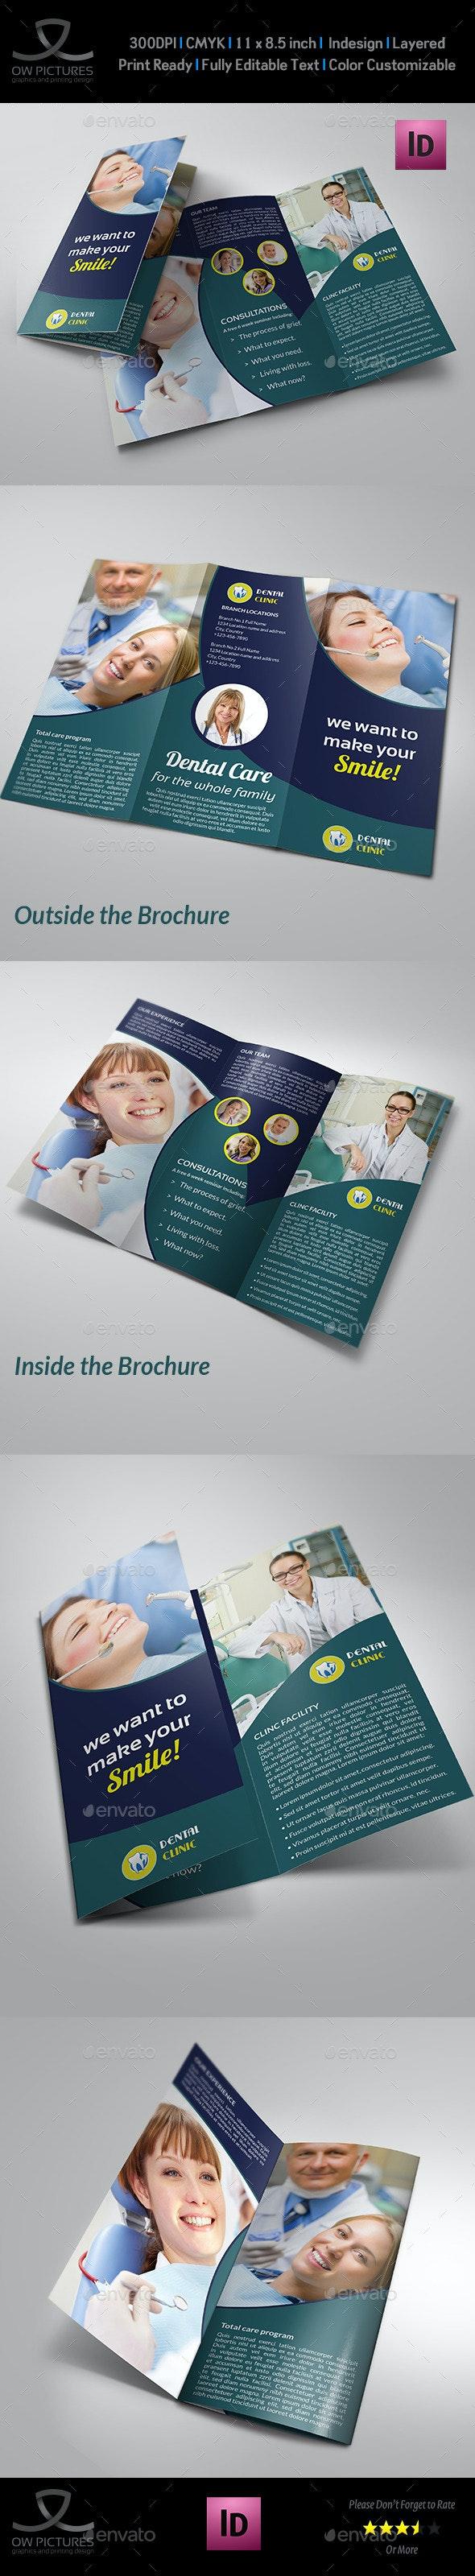 Dental Clinic Tri-Fold Brochure Vol.3 - Brochures Print Templates